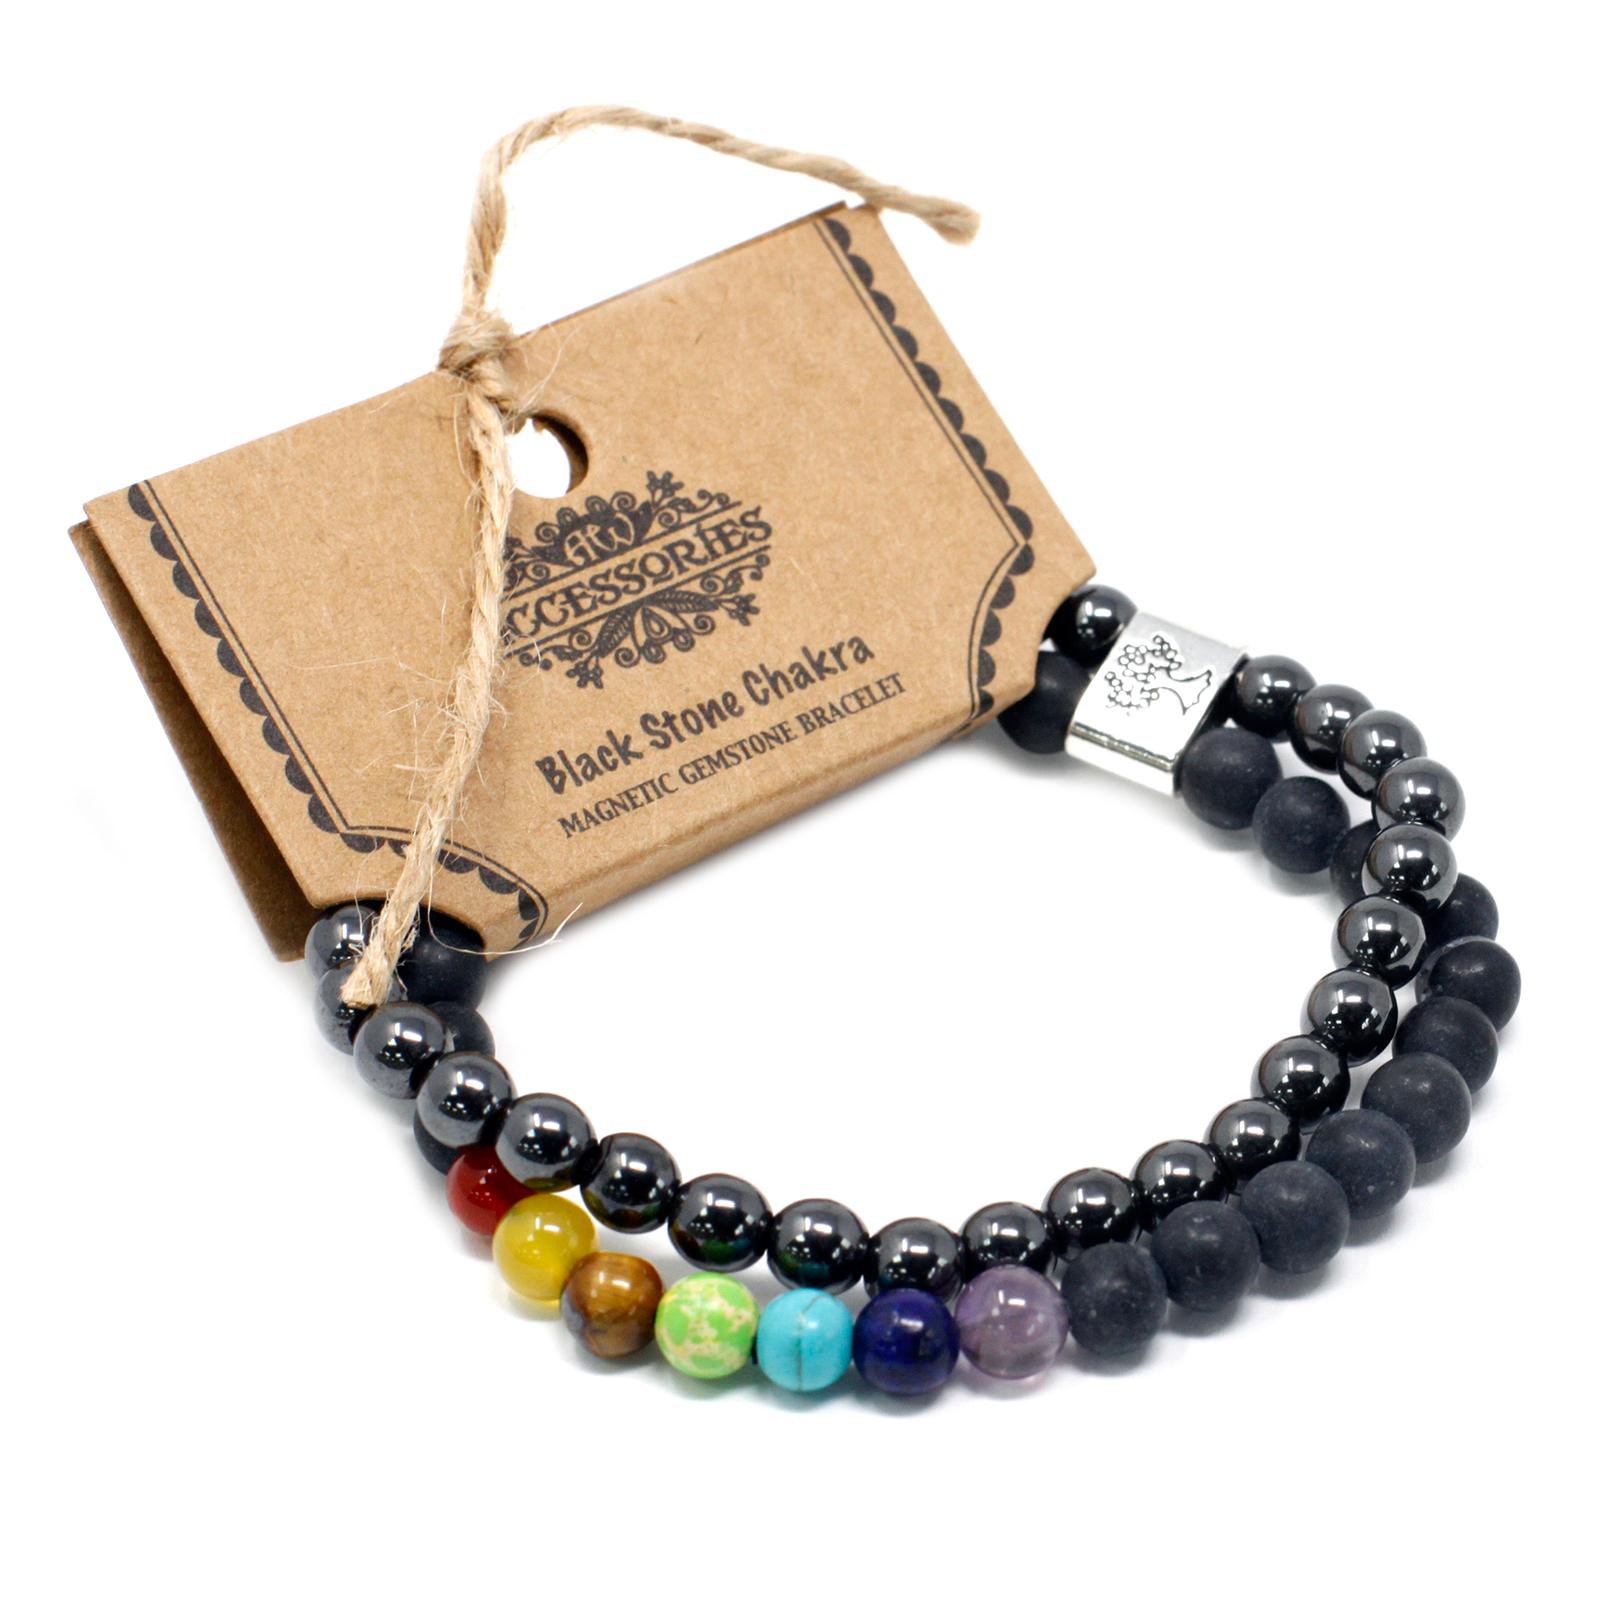 Magnetic Gemstone Bracelet Black Stone Chakra